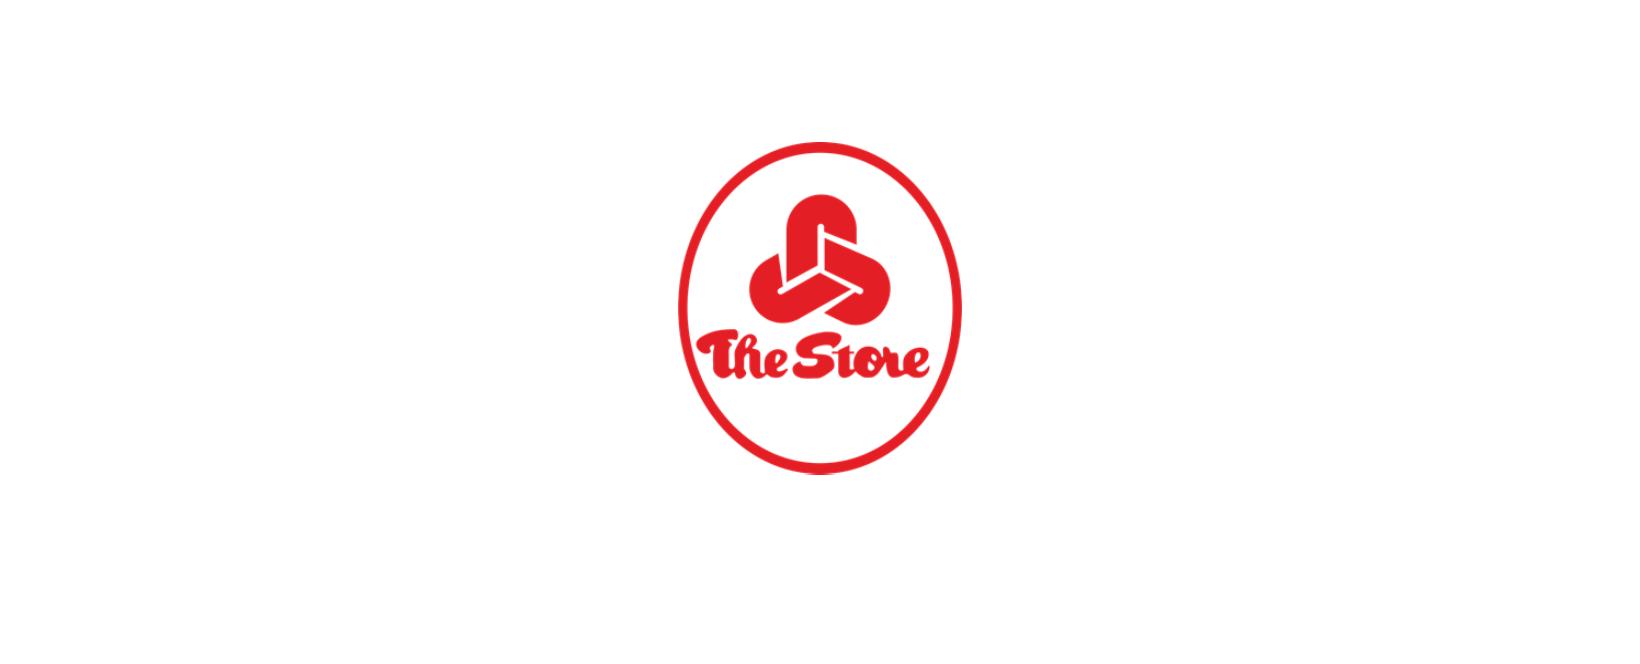 thestore Discount Code 2021